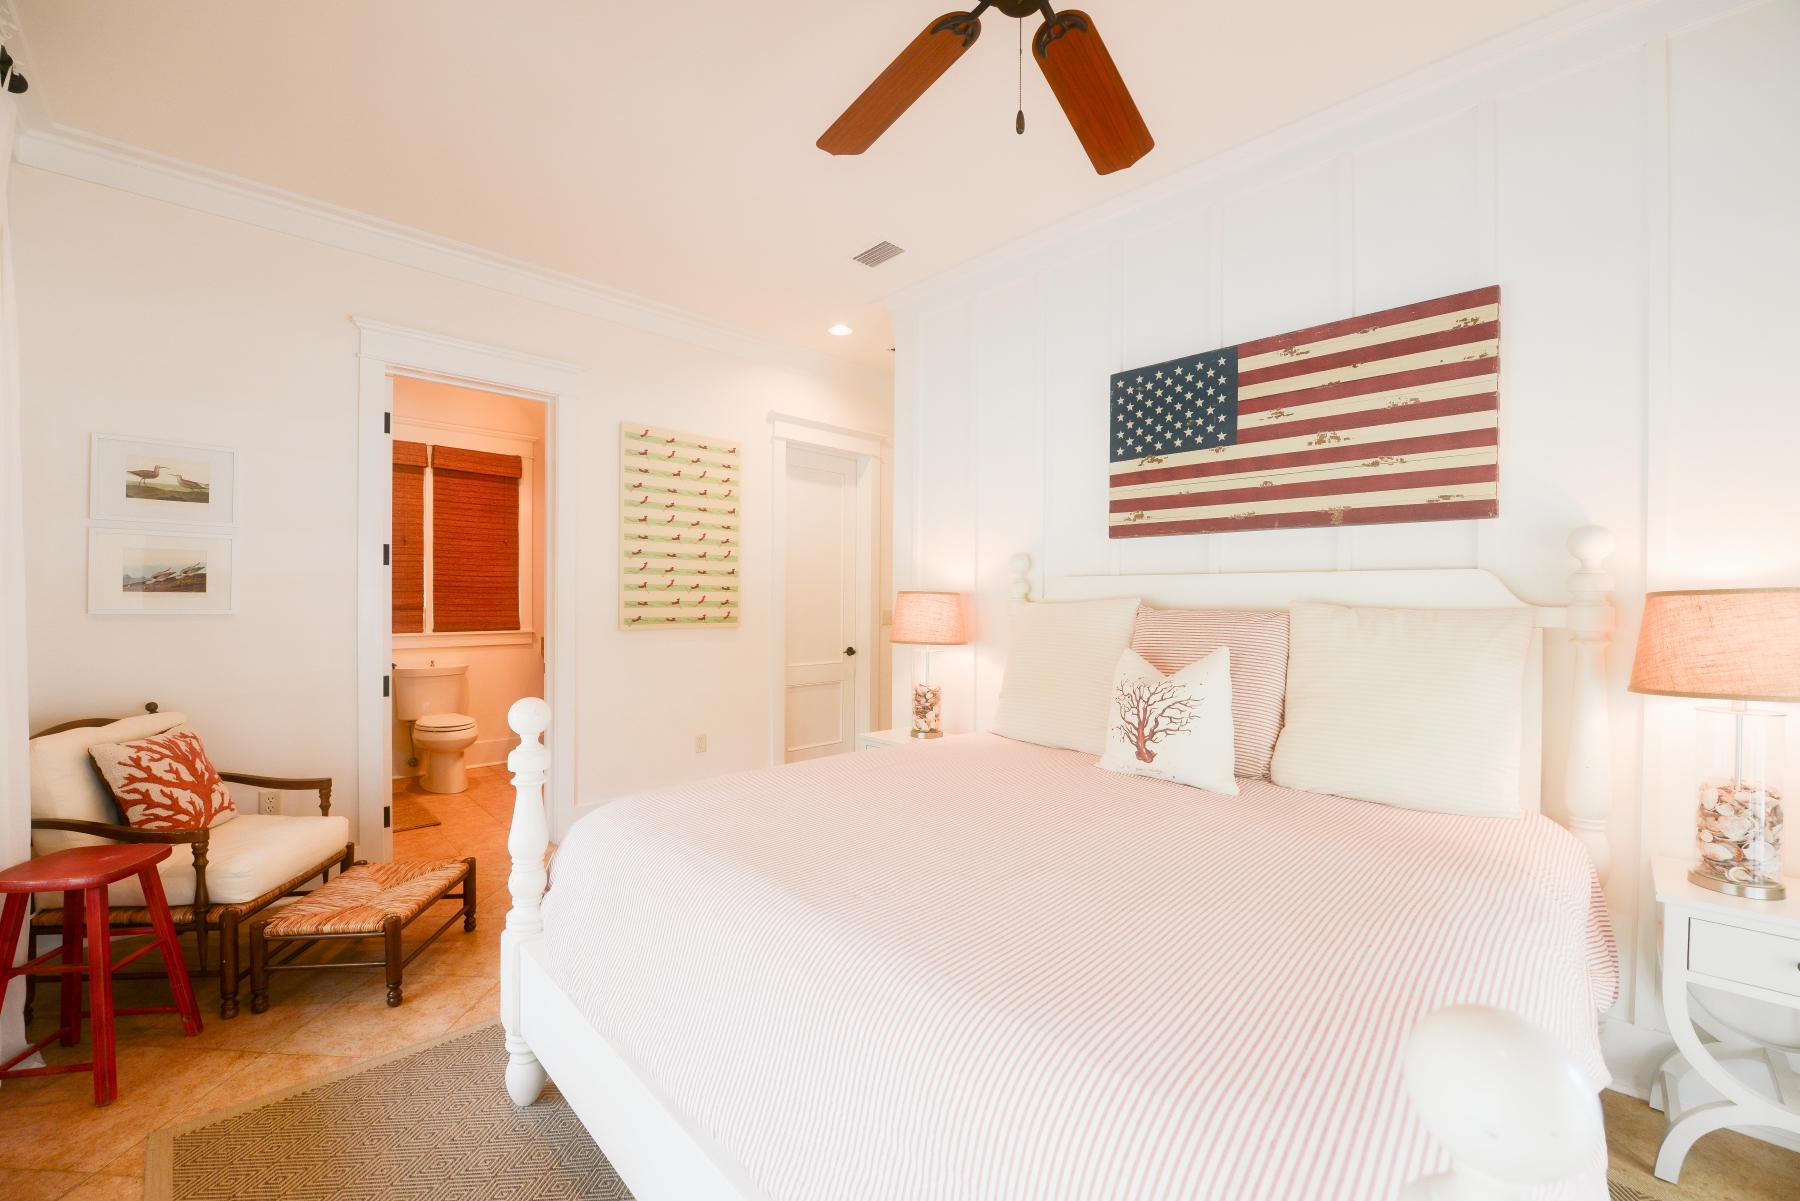 Watercolor florida beach house king flag room.jpeg